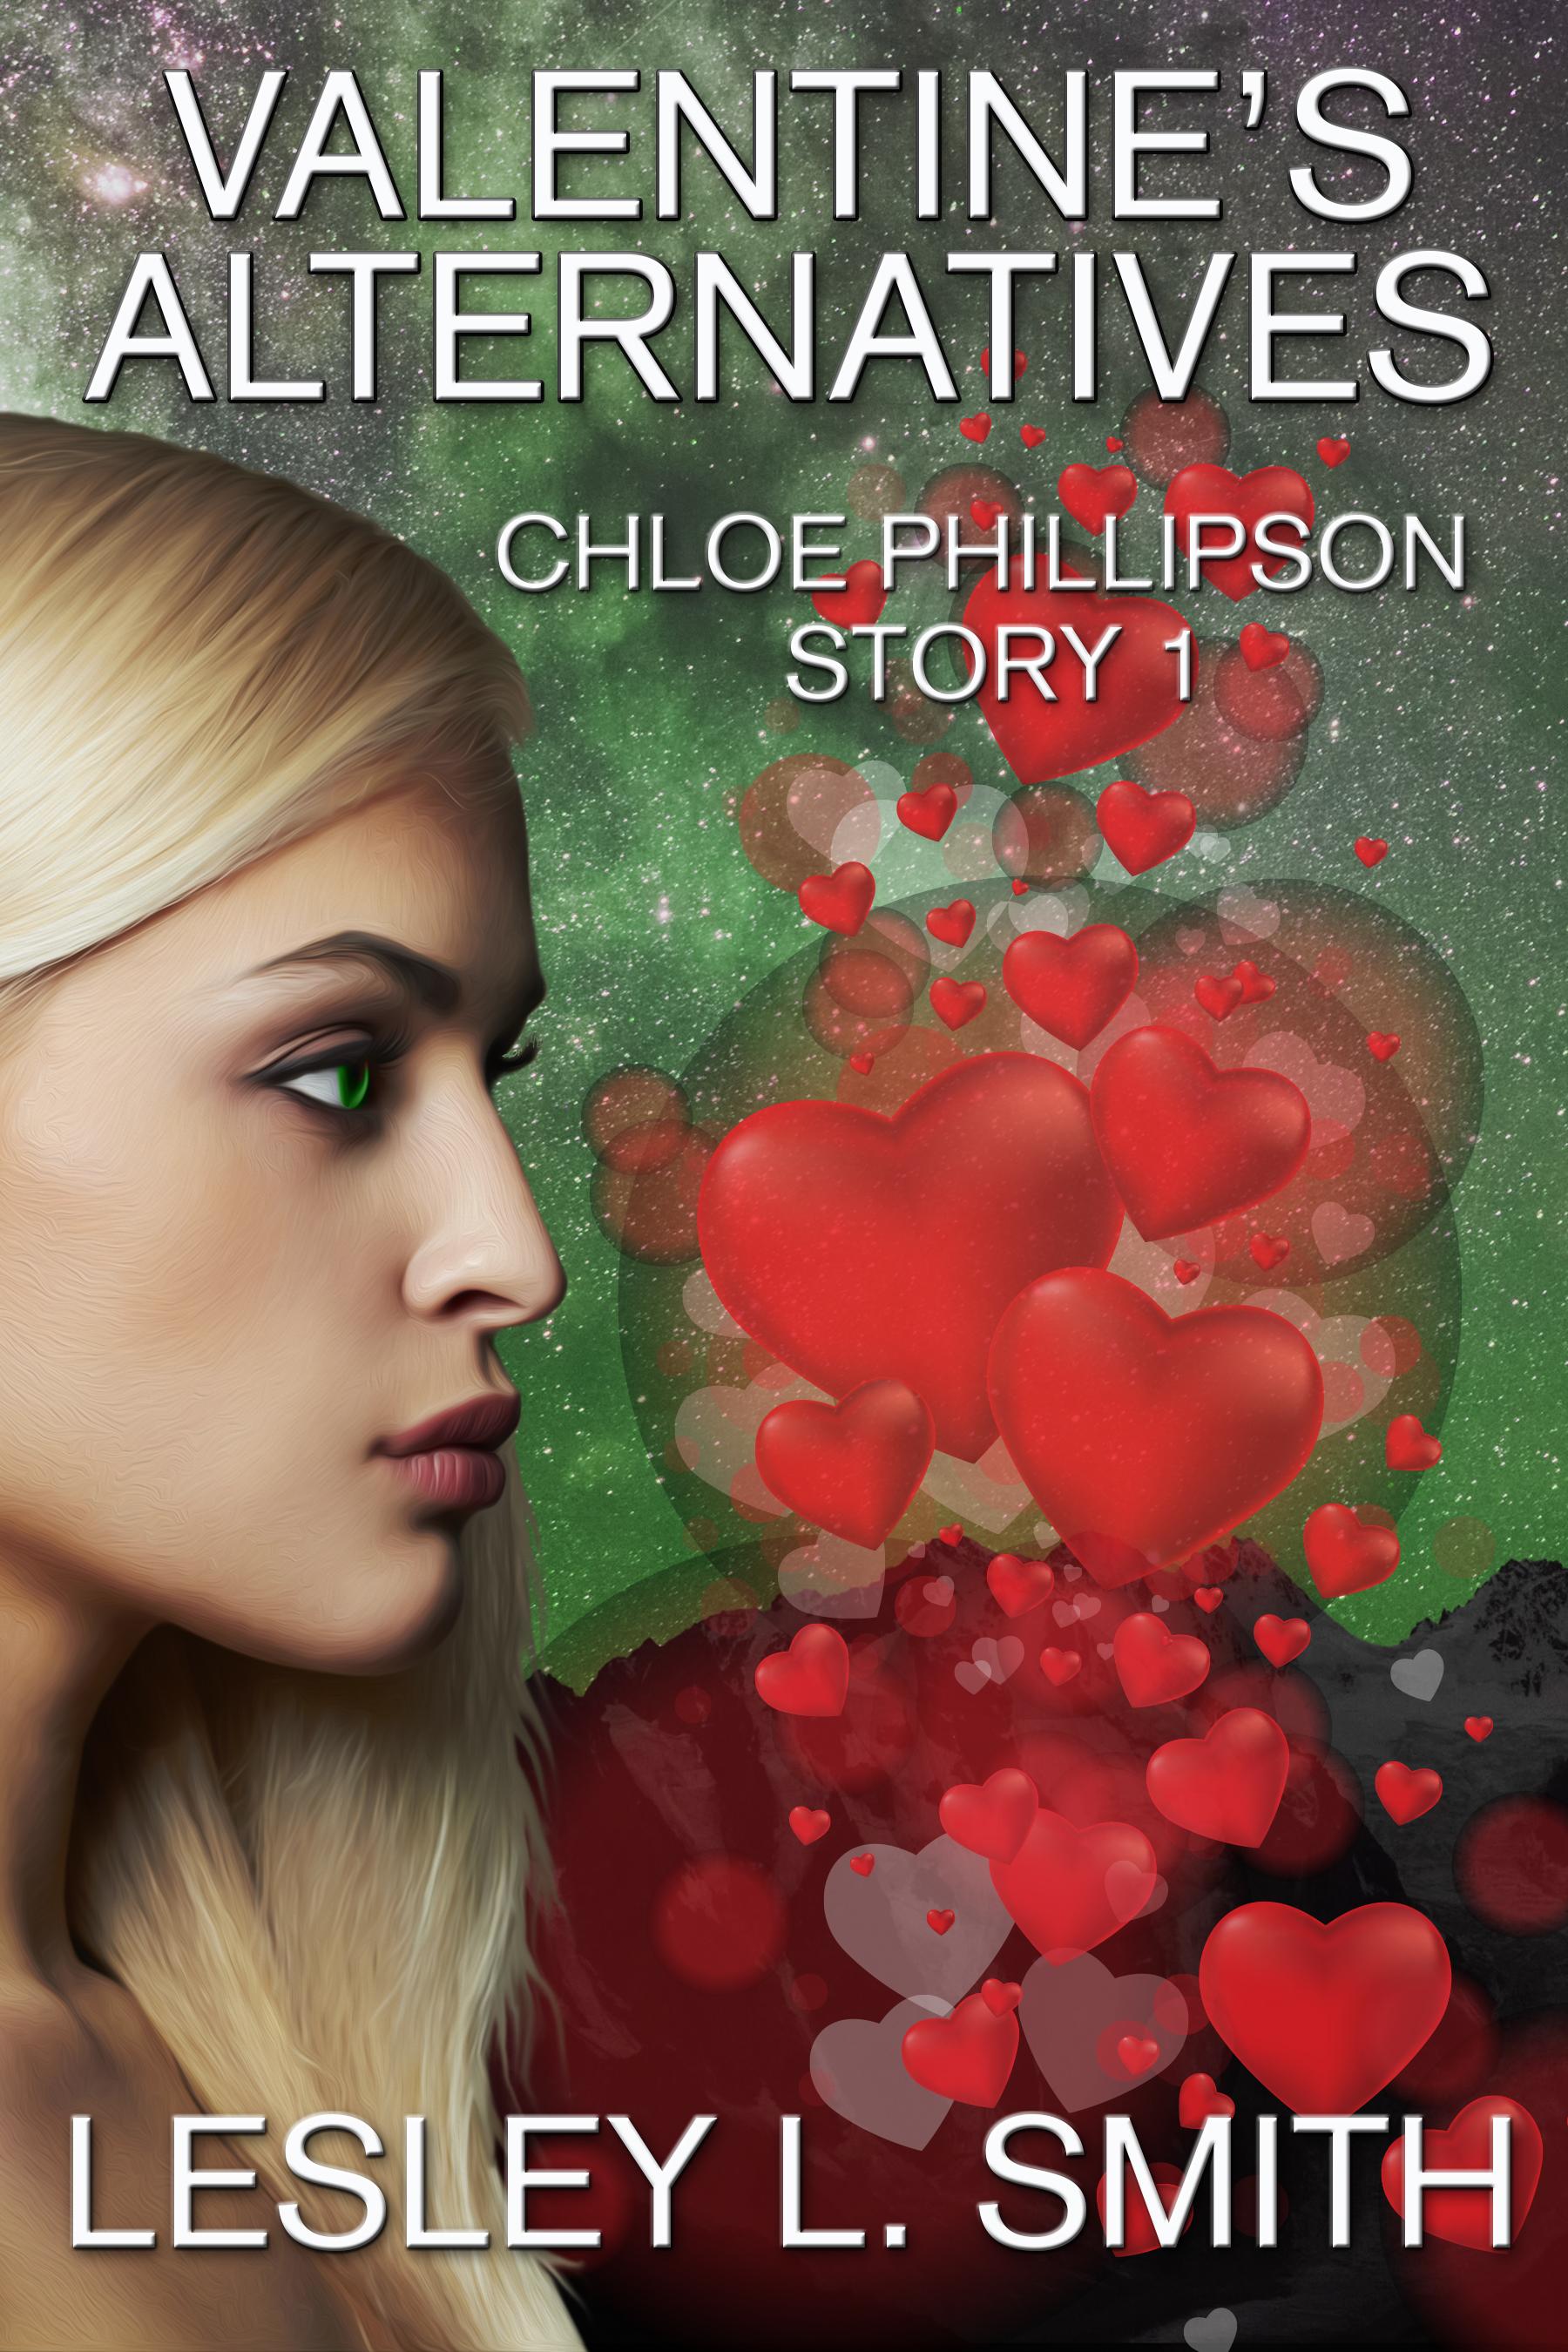 pic of Chloe